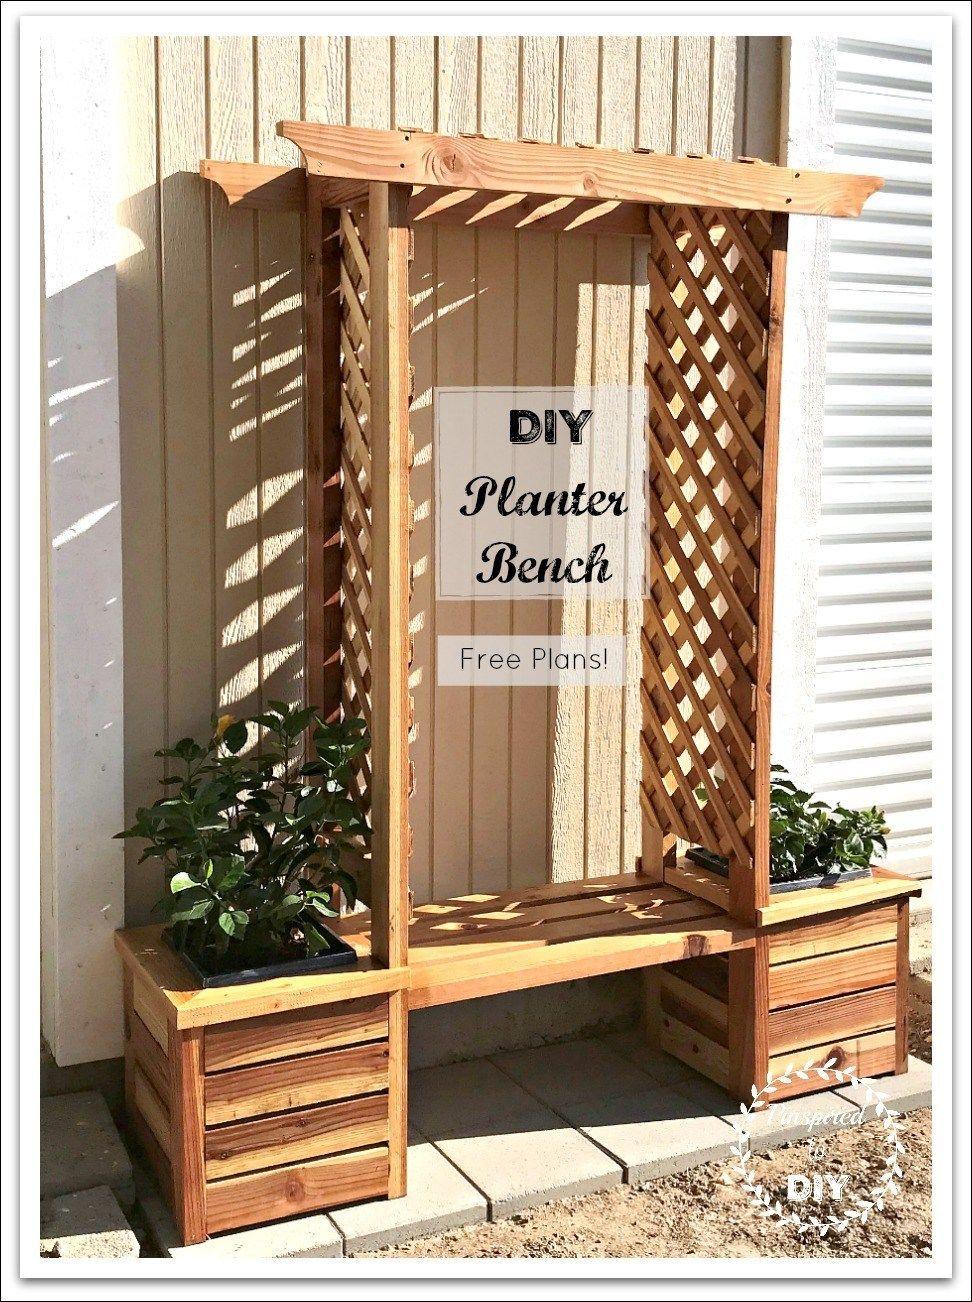 Diy Planter Box Bench Seat Free Building Plans Diy Planters Planter Boxes Diy Planter Box